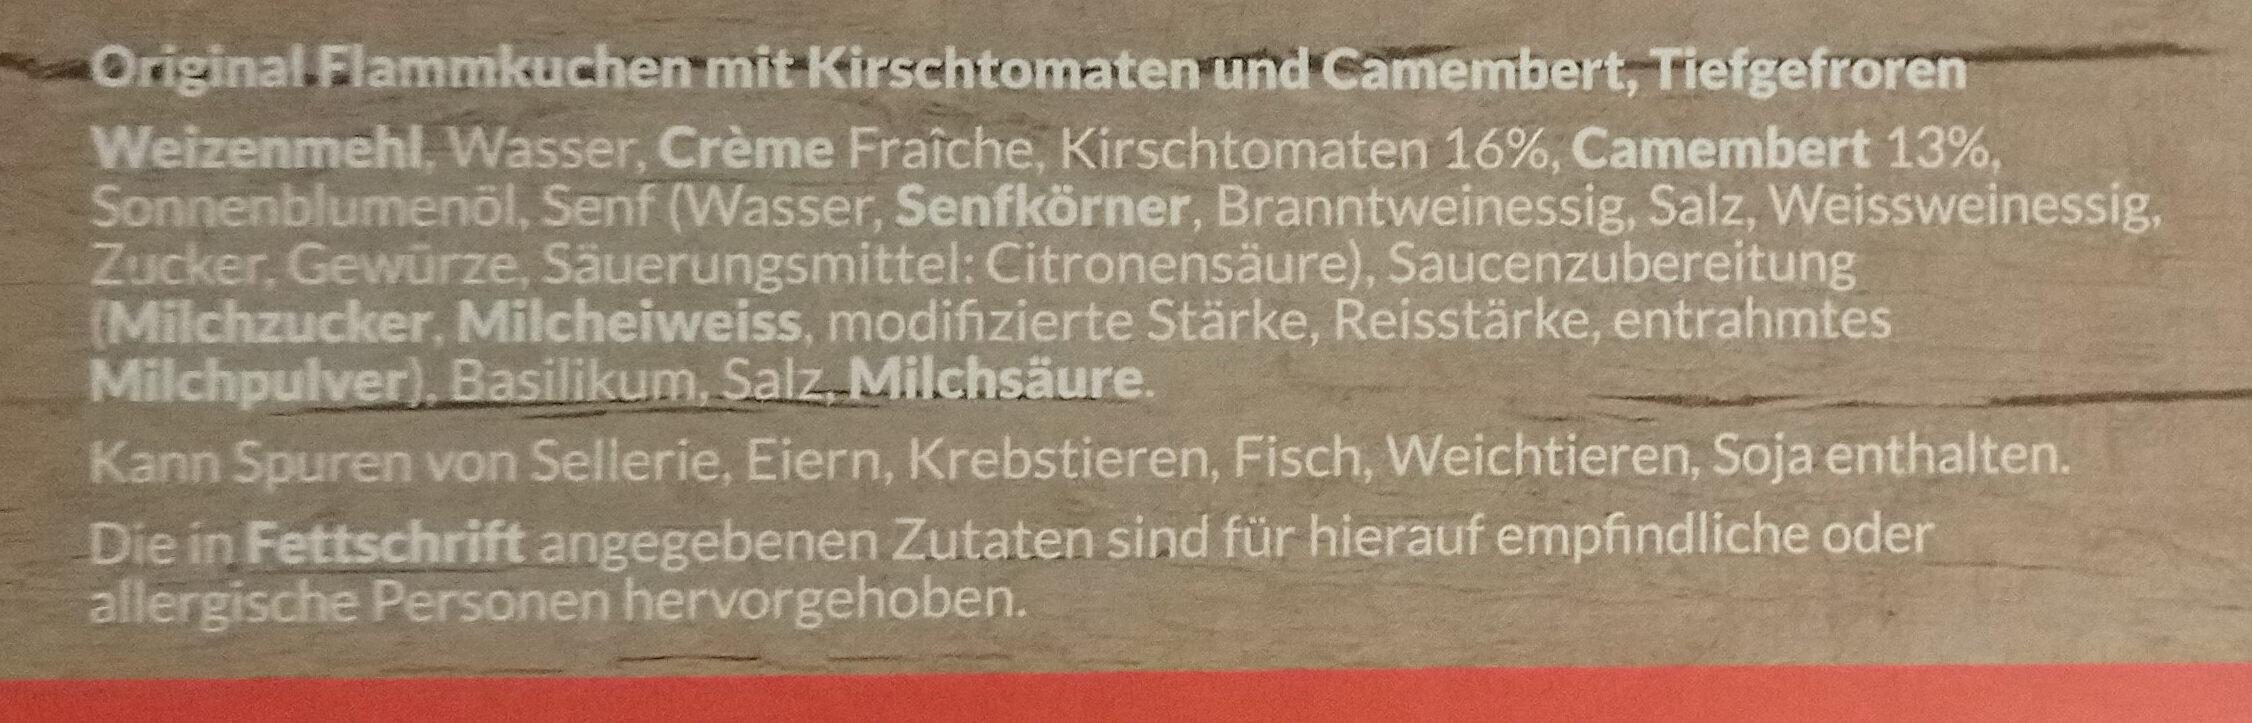 Flammkuchen - Ingredients - de